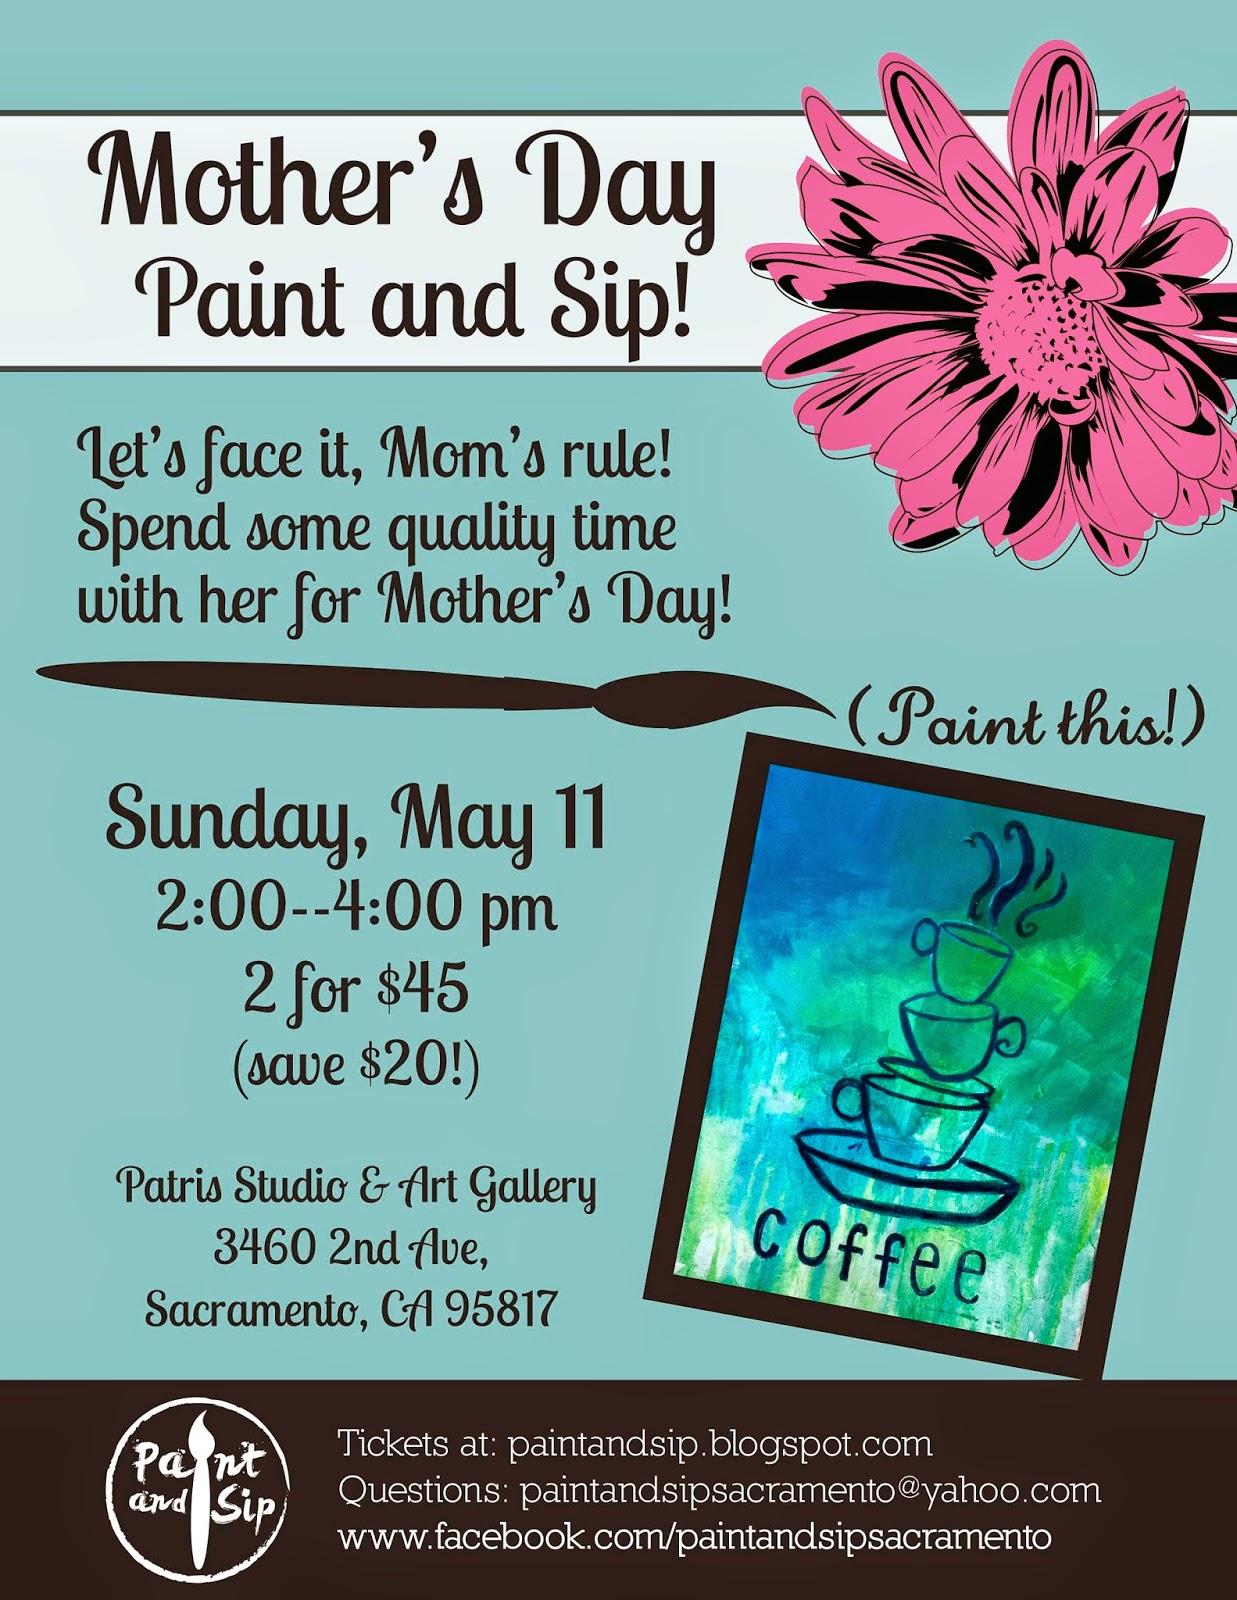 http://2.bp.blogspot.com/-IZPARsXVcbg/U1qt2zpN2TI/AAAAAAAAATo/CEX8pXLC3Q8/s1600/Mothers+day+Paint+and+Sipai.jpg